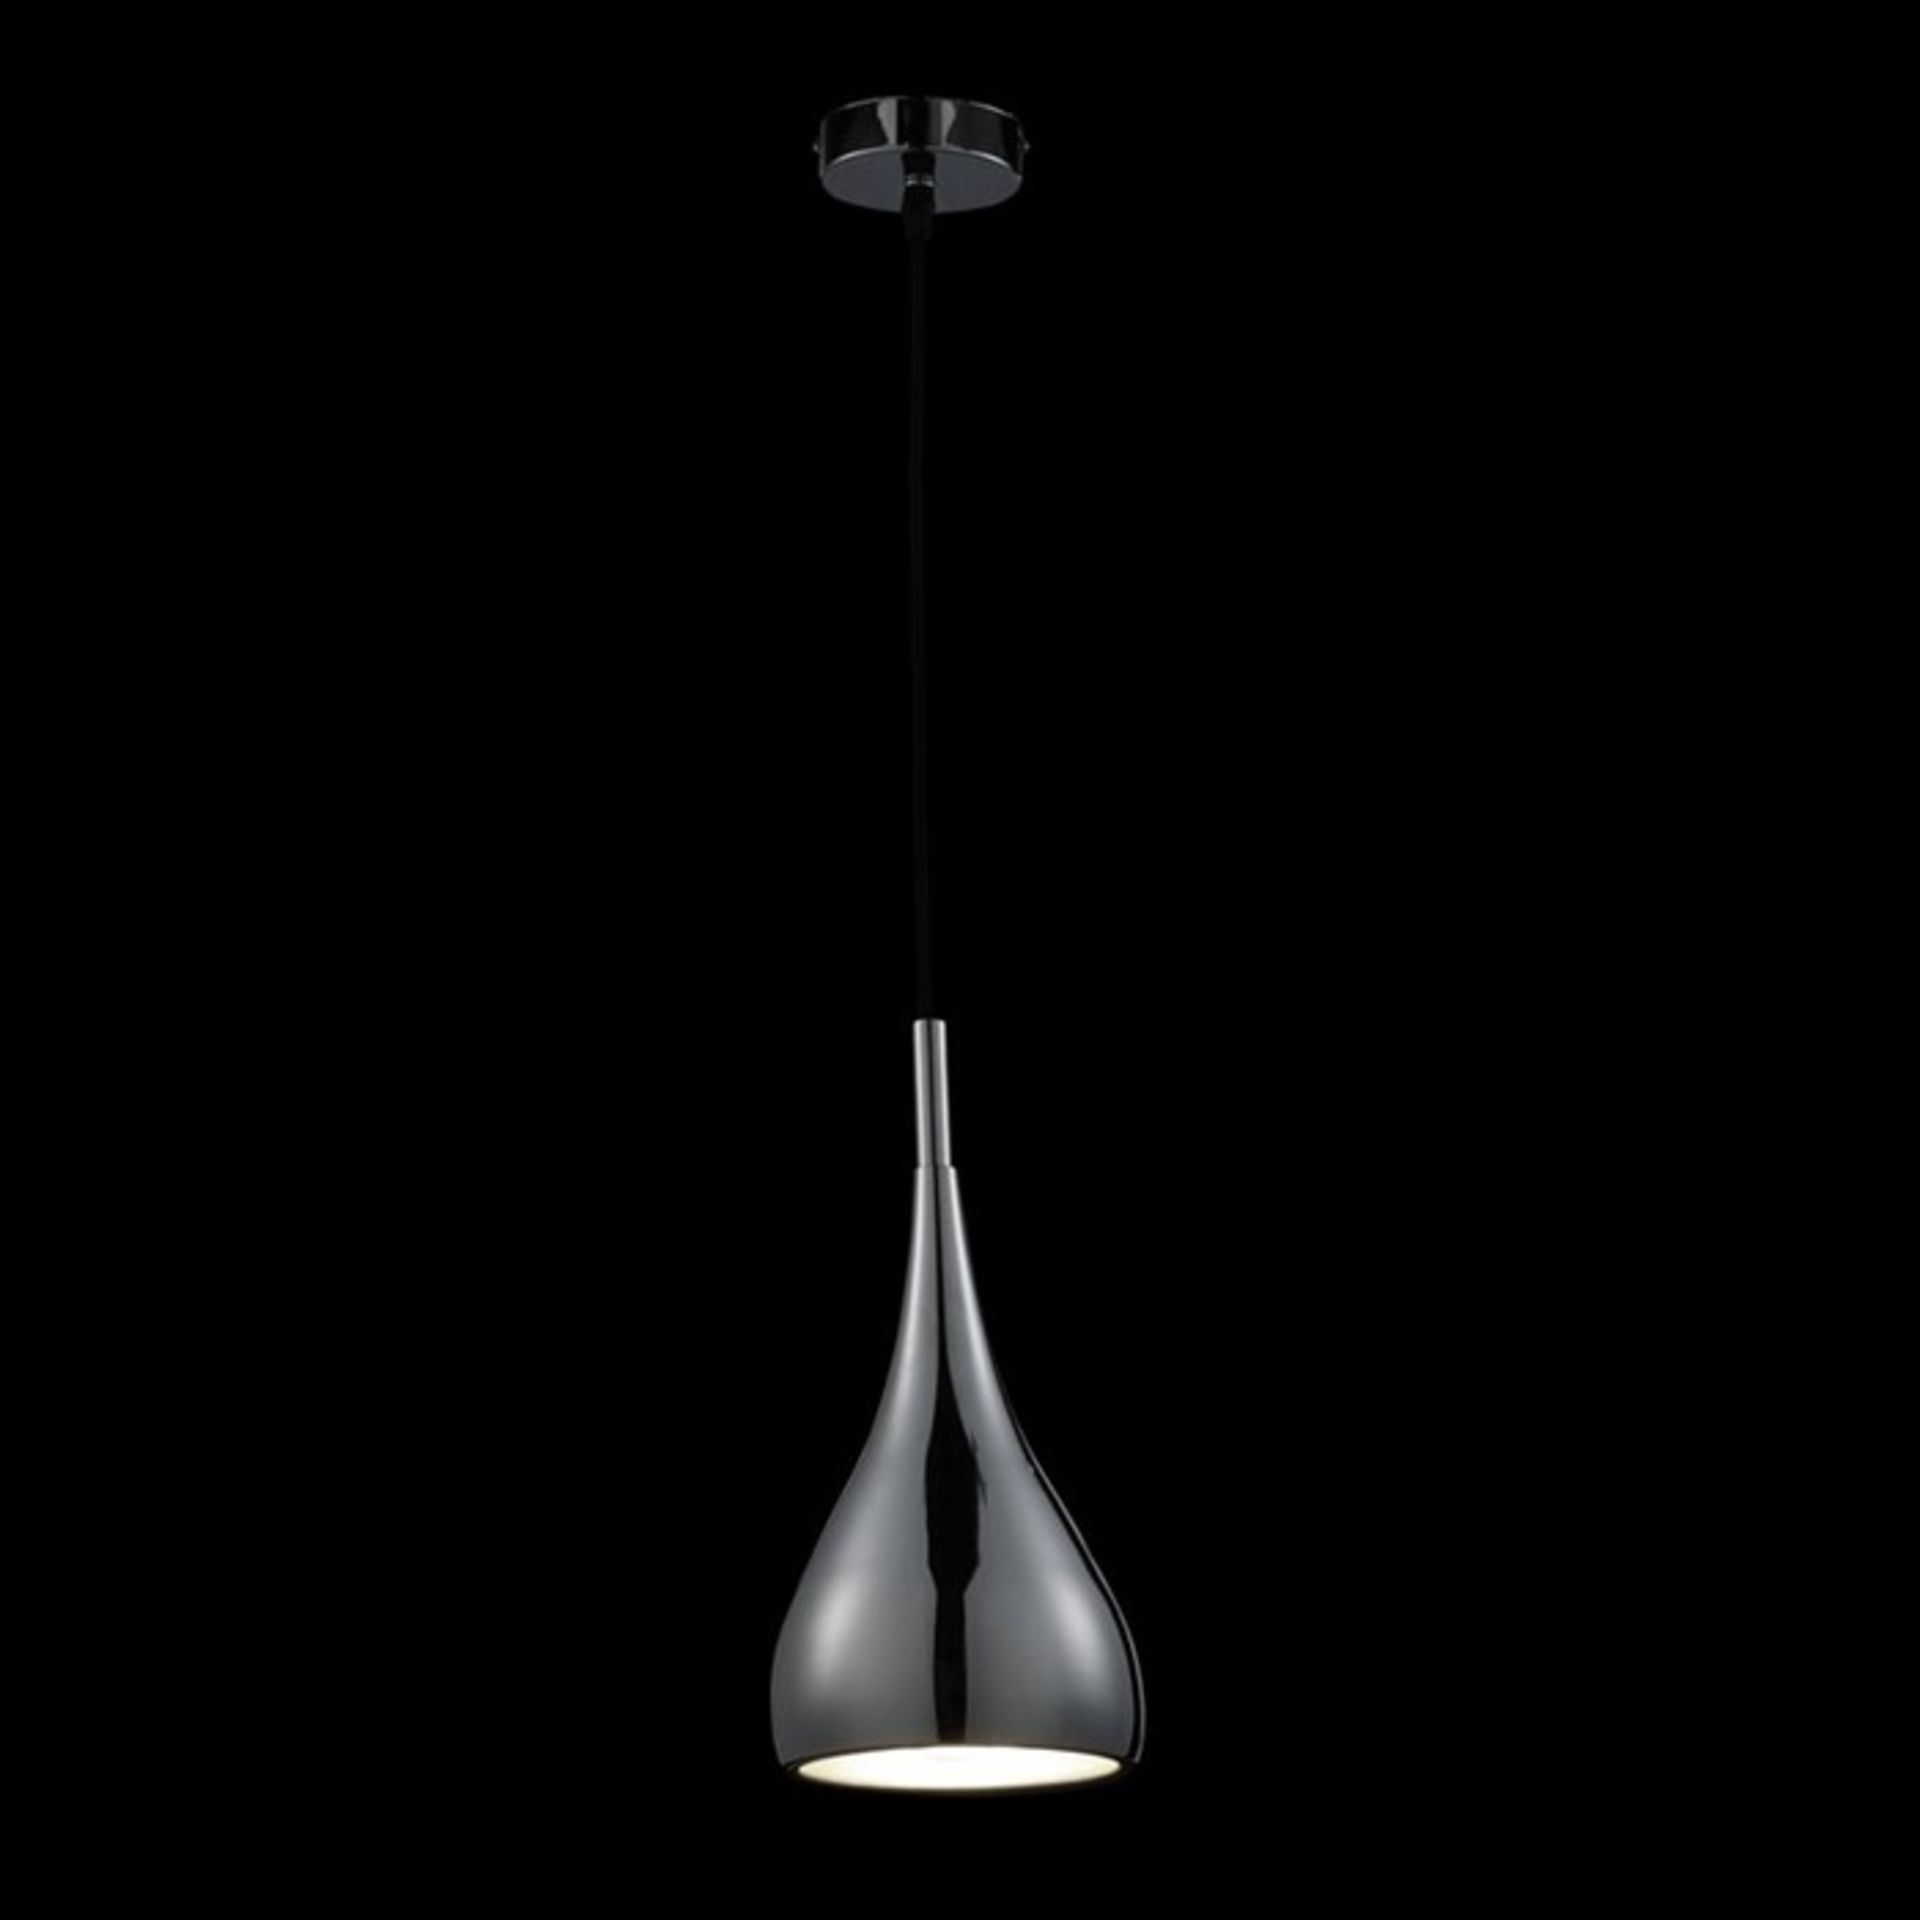 Wrought Studio, Heider 1-Light Teardrop Pendant - RRP £92.49 (NAVE4258 - 13943/30) 7D